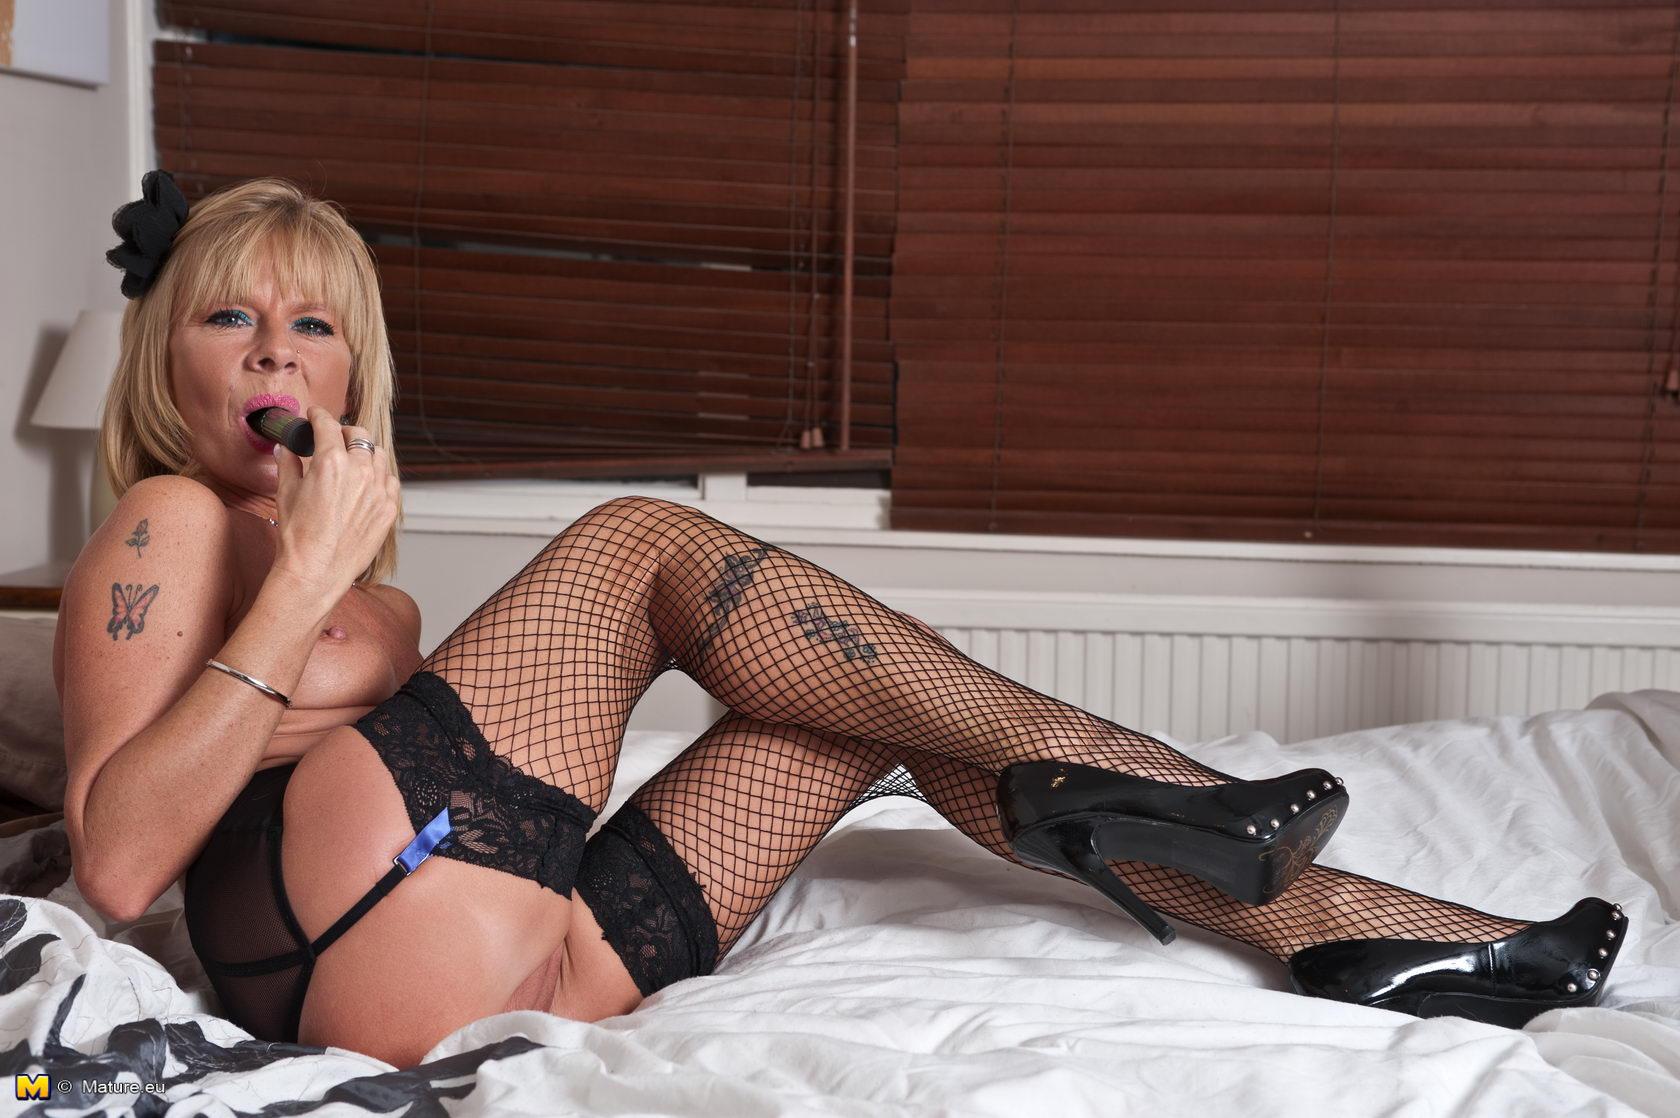 Cougar milf in nylons garter belts high heel pumps furs anal 2